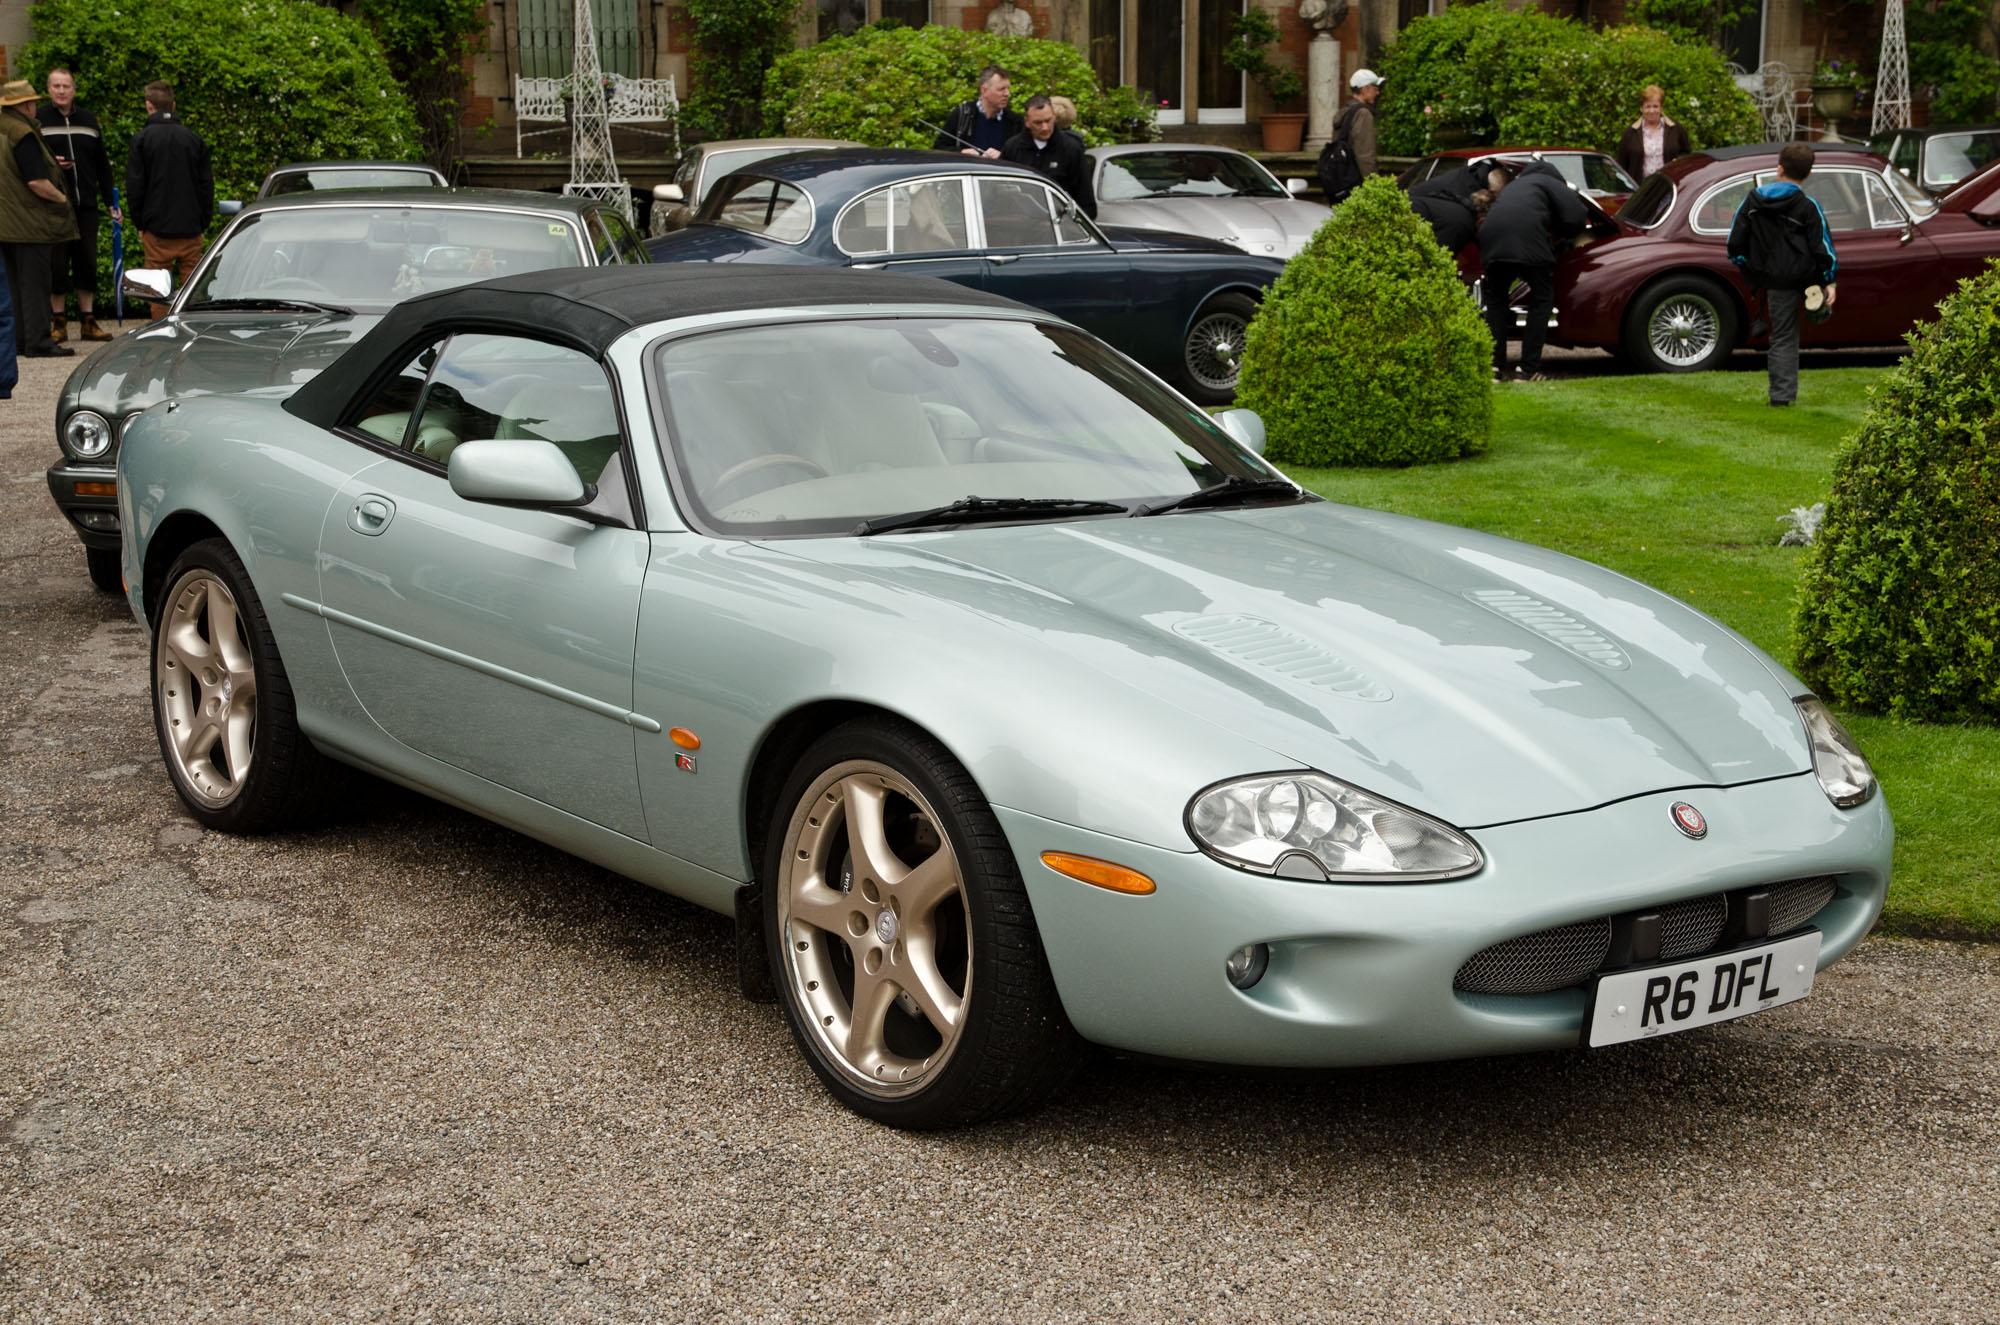 File Jaguar Xkr Convertible X100 In Light Blue Metallic Facing Right Jpg Wikimedia Commons